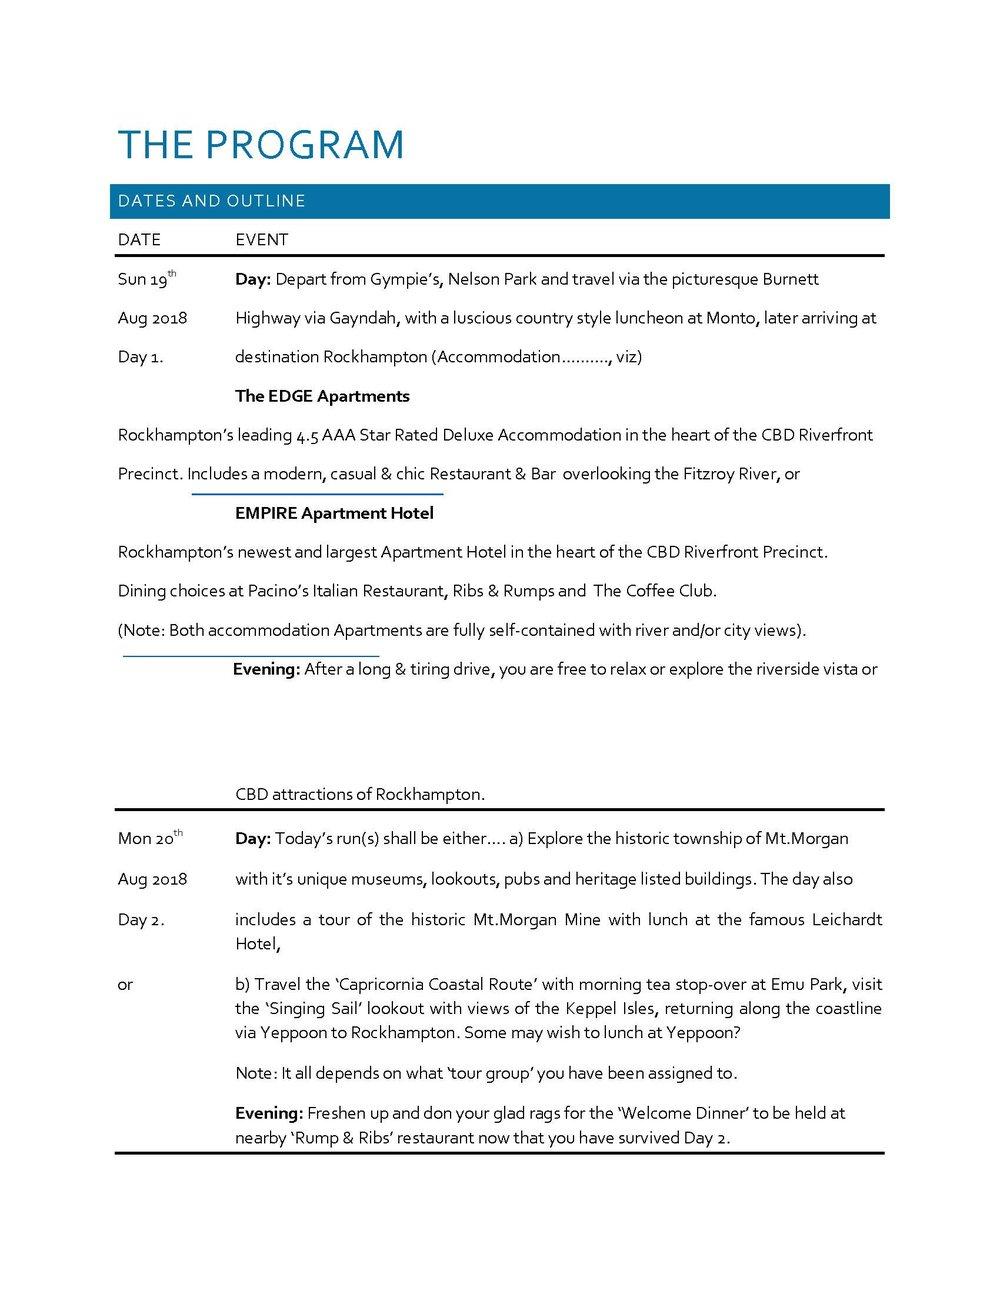 The Program QMeet18_Page_1.jpg